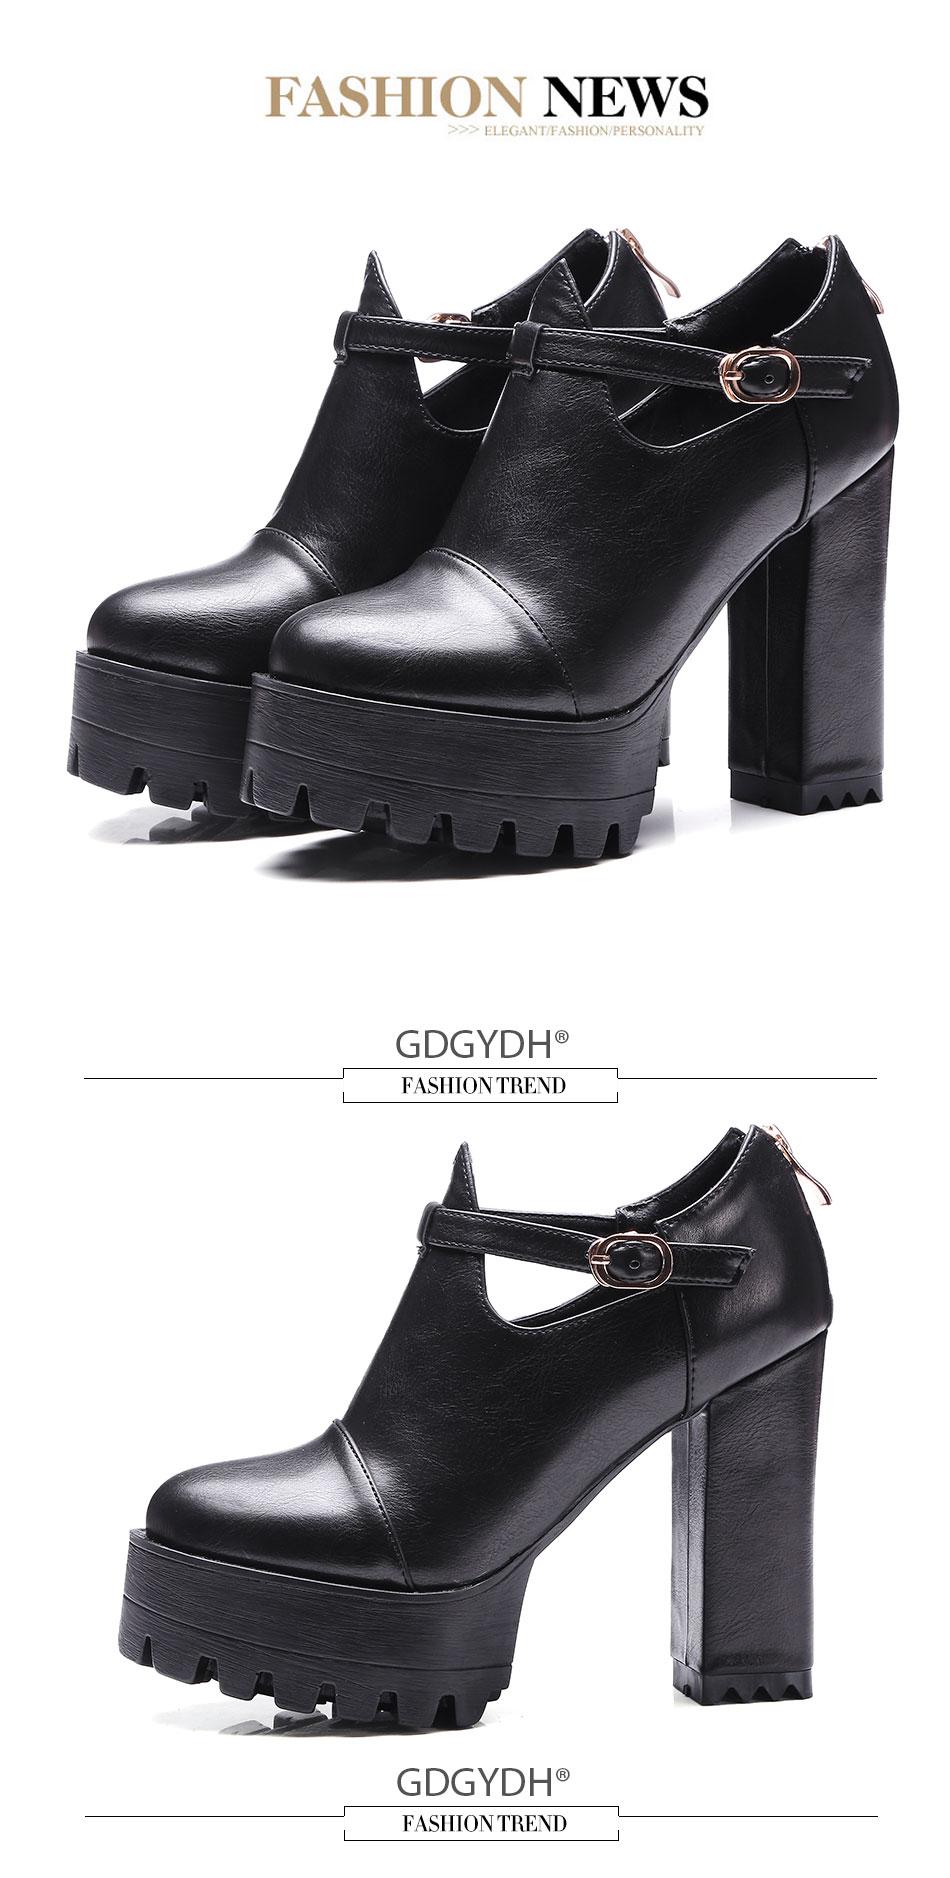 Gdgydh Новинка 2019 г. весенне-осенняя повседневная обувь на высоком каблуке 71219eb8e5001